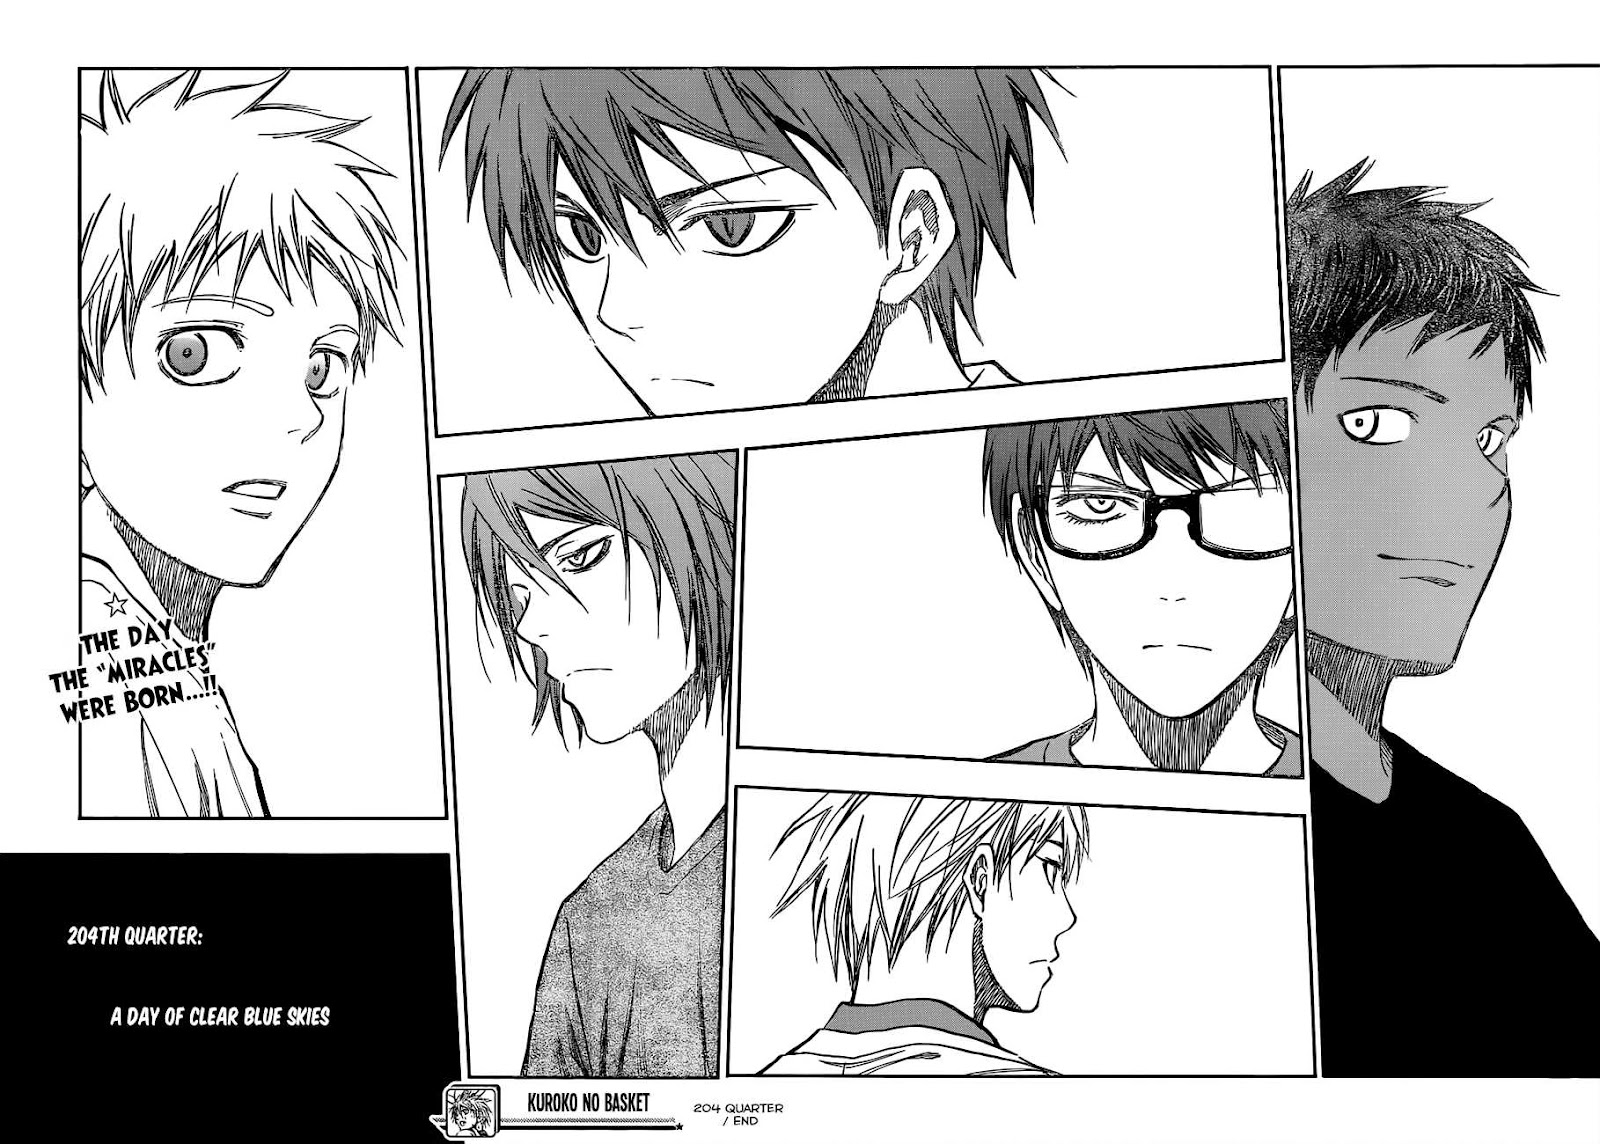 Kuroko no Basket Manga Chapter 204 - Image 18-19